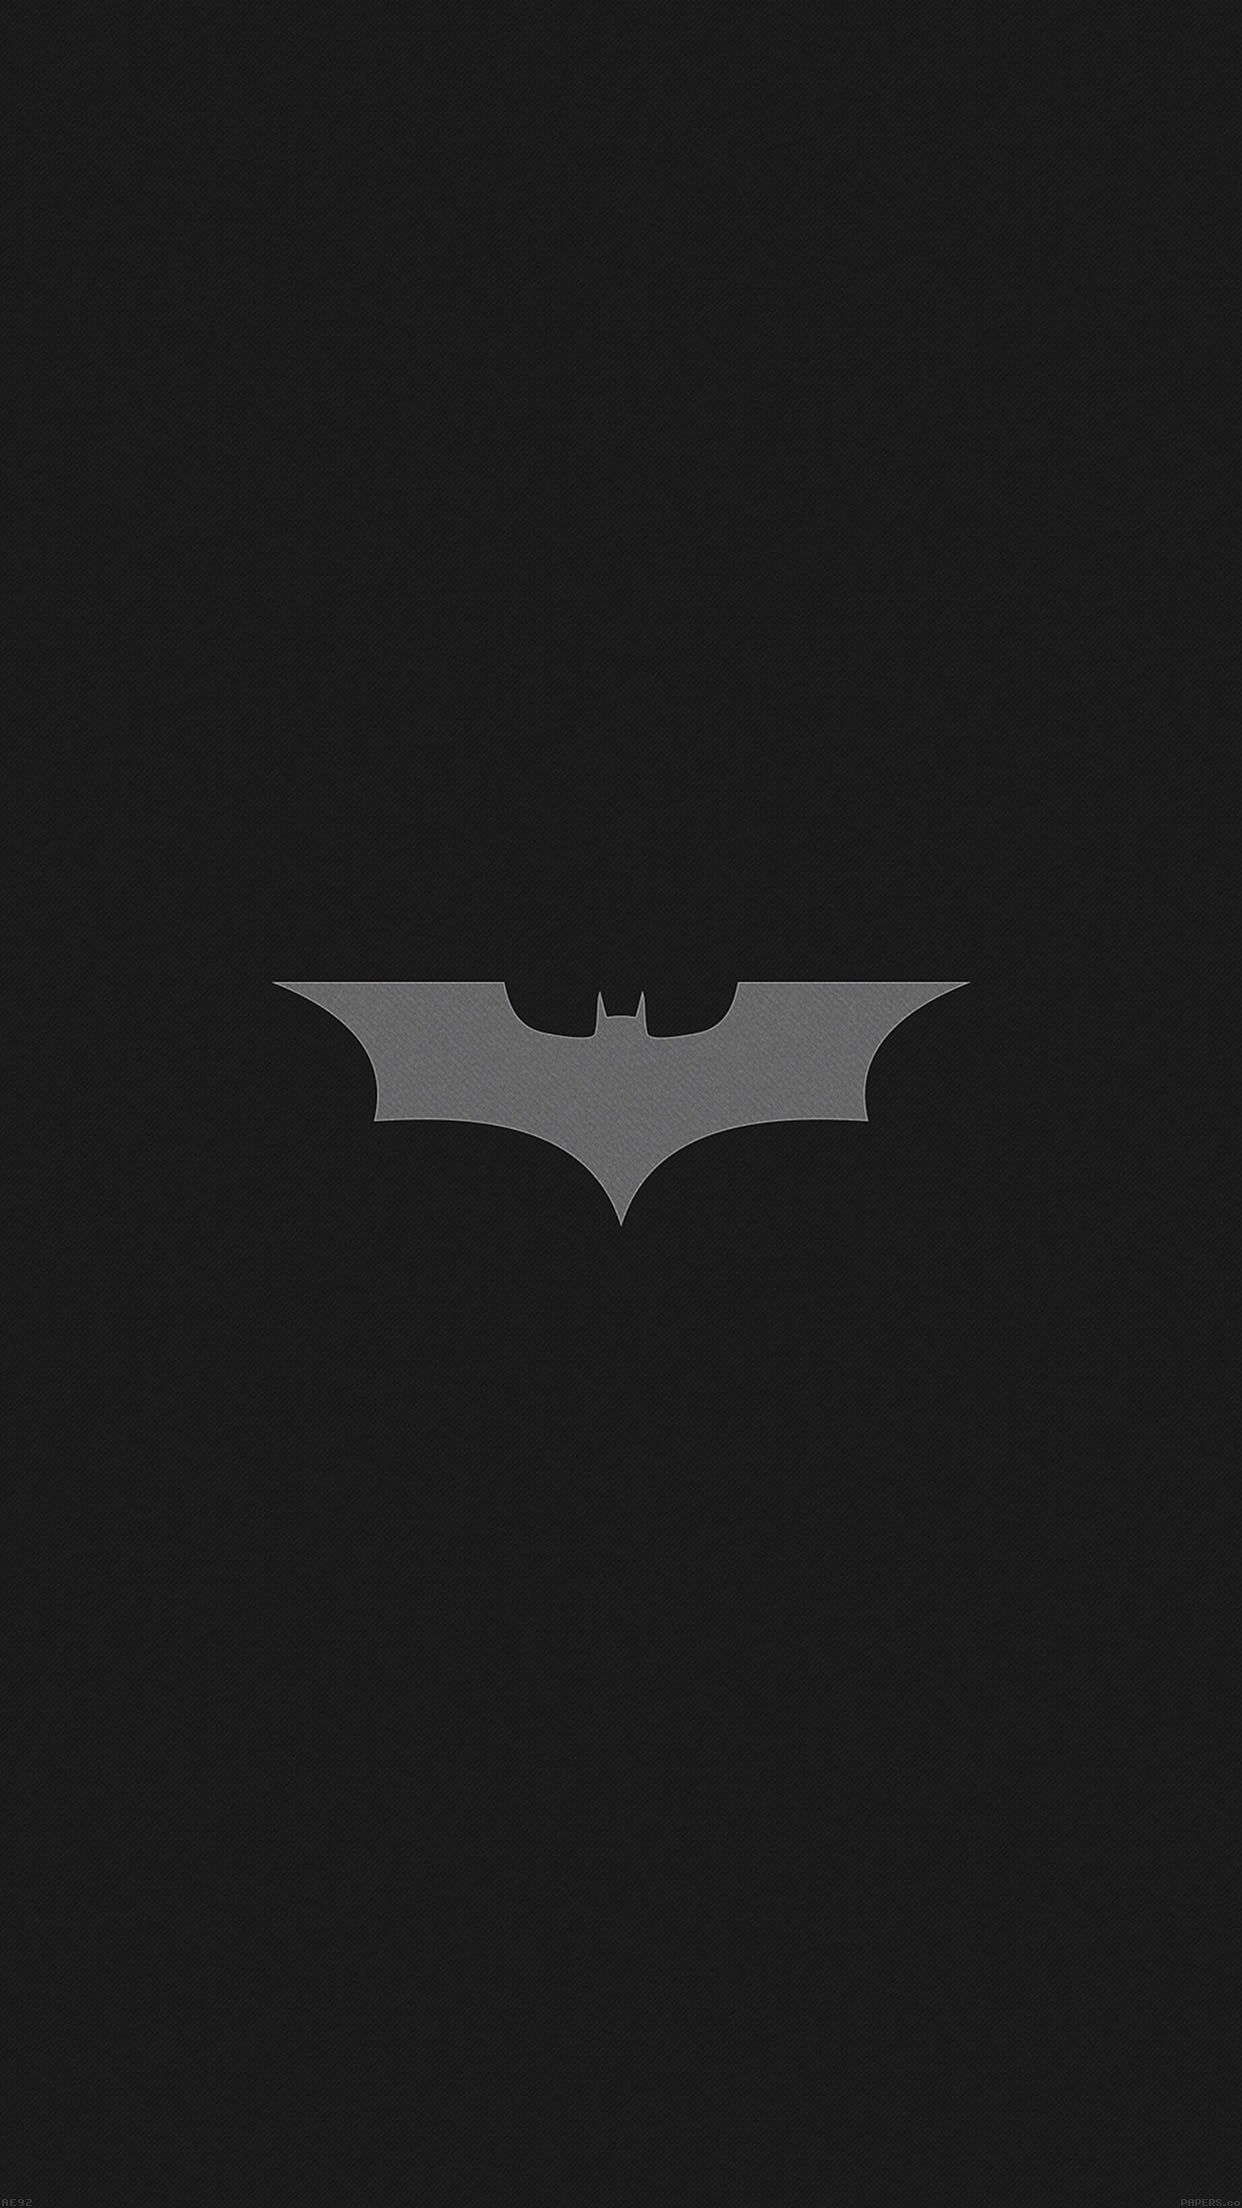 Batman Logo Iphone Wallpapers Images Batman Hd Fondo